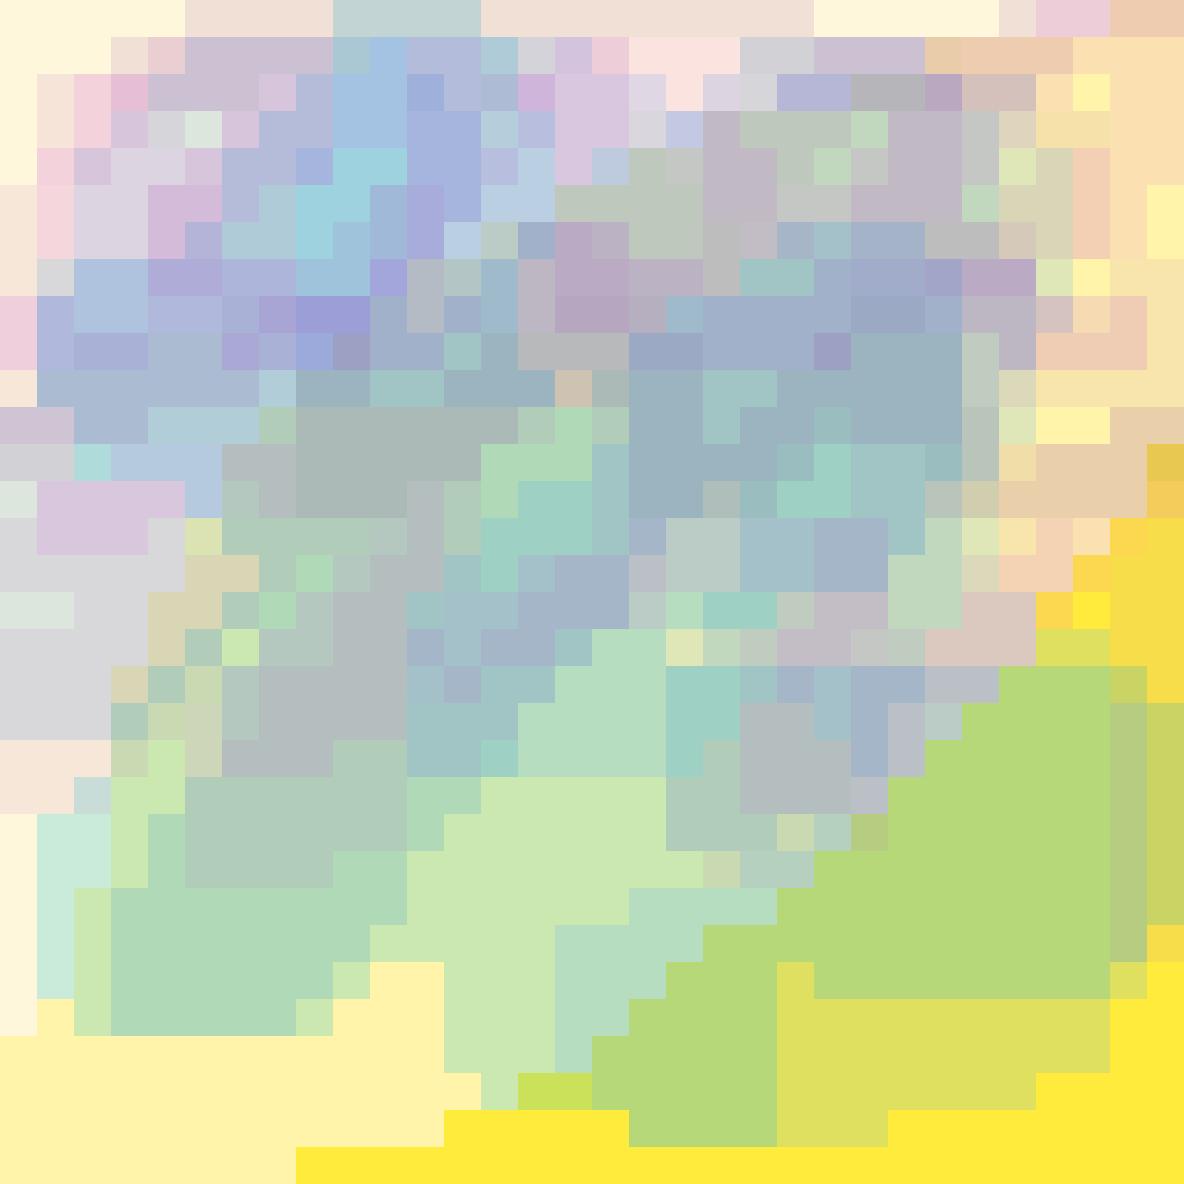 5 Minute Art Challenge by WOF-RainWing-18